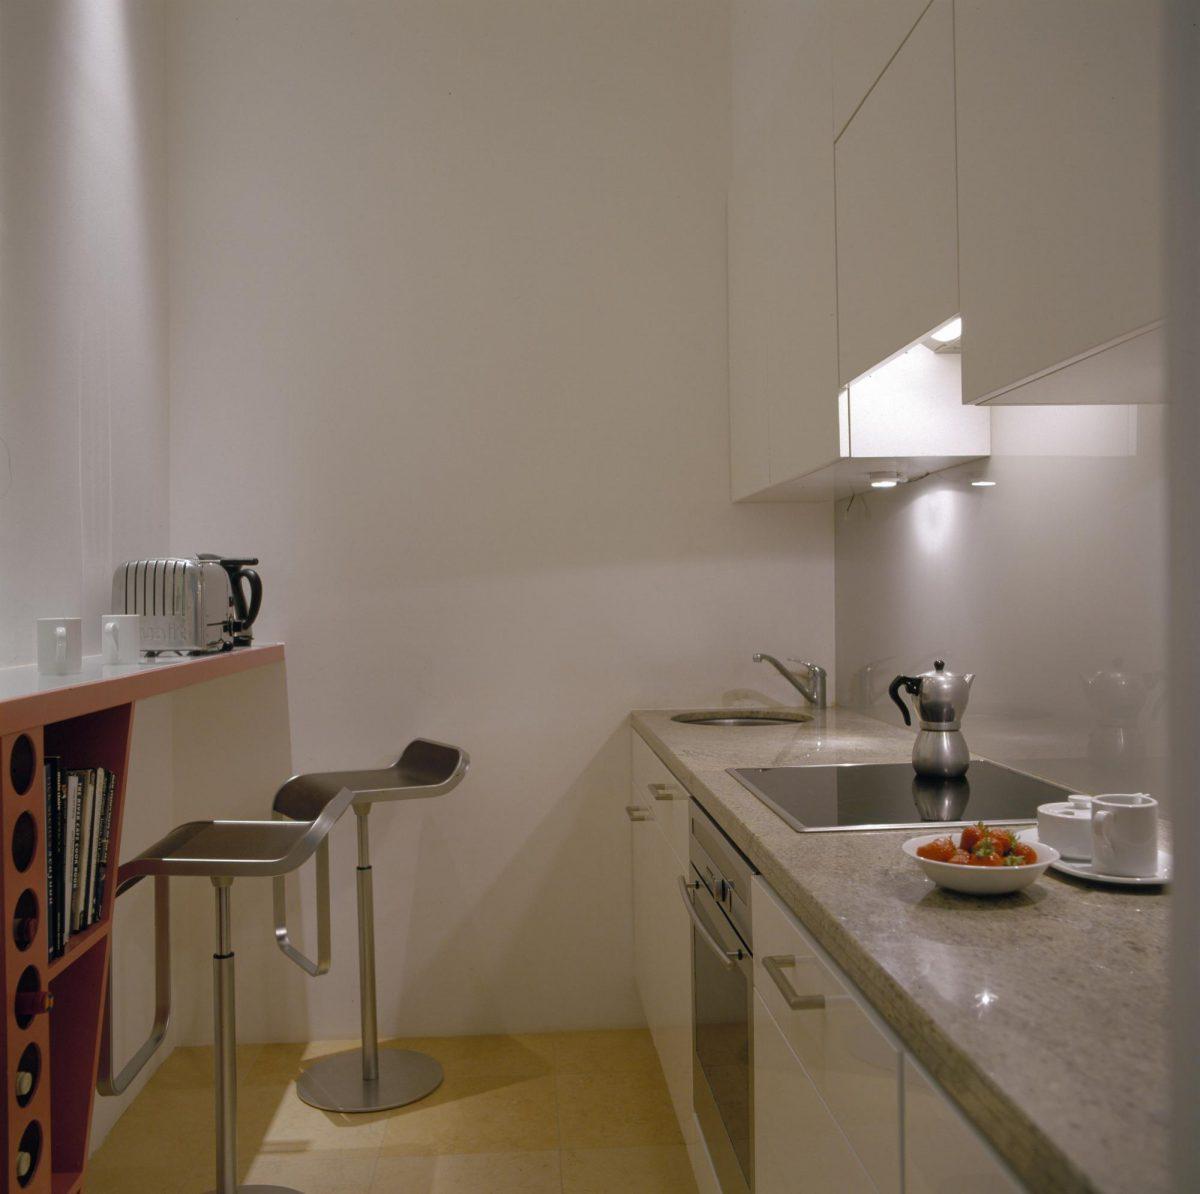 Malá kuchyň ve velkém stylu